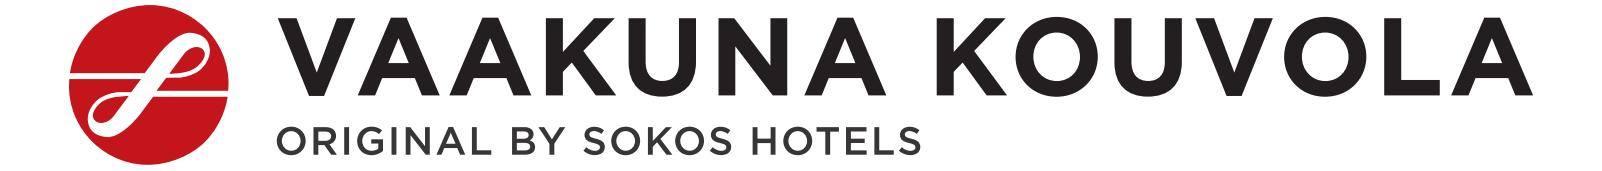 https://www.sokoshotels.fi/fi/kouvola